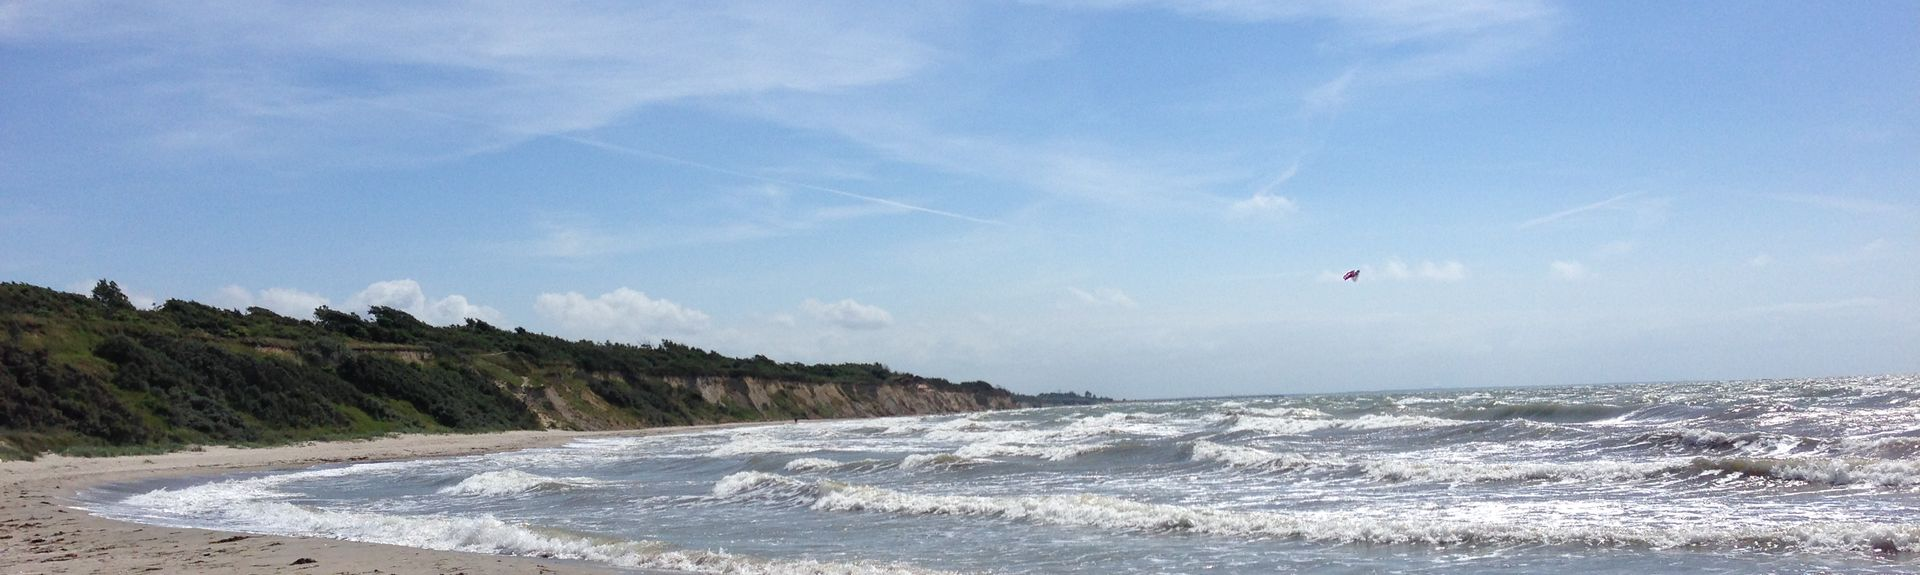 Playa de Darsser Ort, Born auf dem Darss, Mecklemburgo-Pomerania Occidental, Alemania